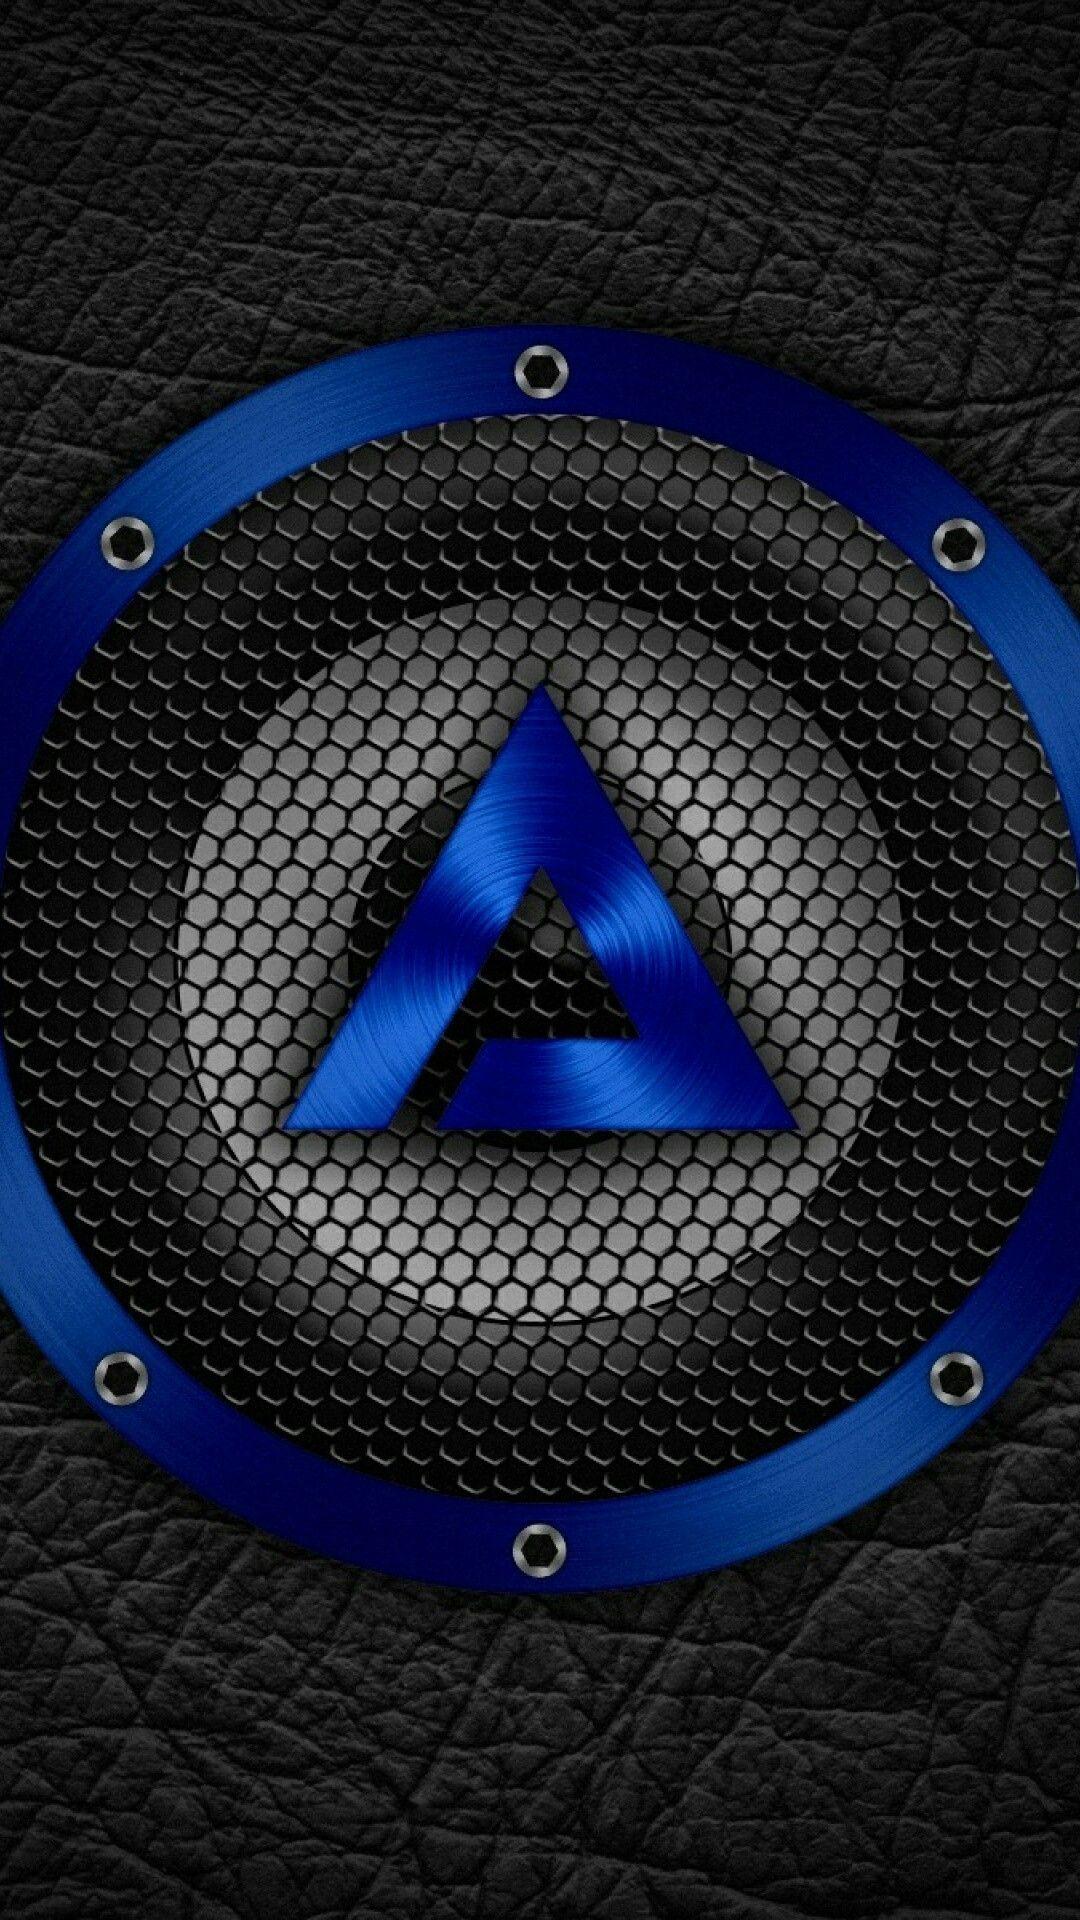 Blue Sound Blue World High Frequency Imagination Revelation Https Imaginationrevelation Com Wallpaper Ponsel Gambar Objek Gambar